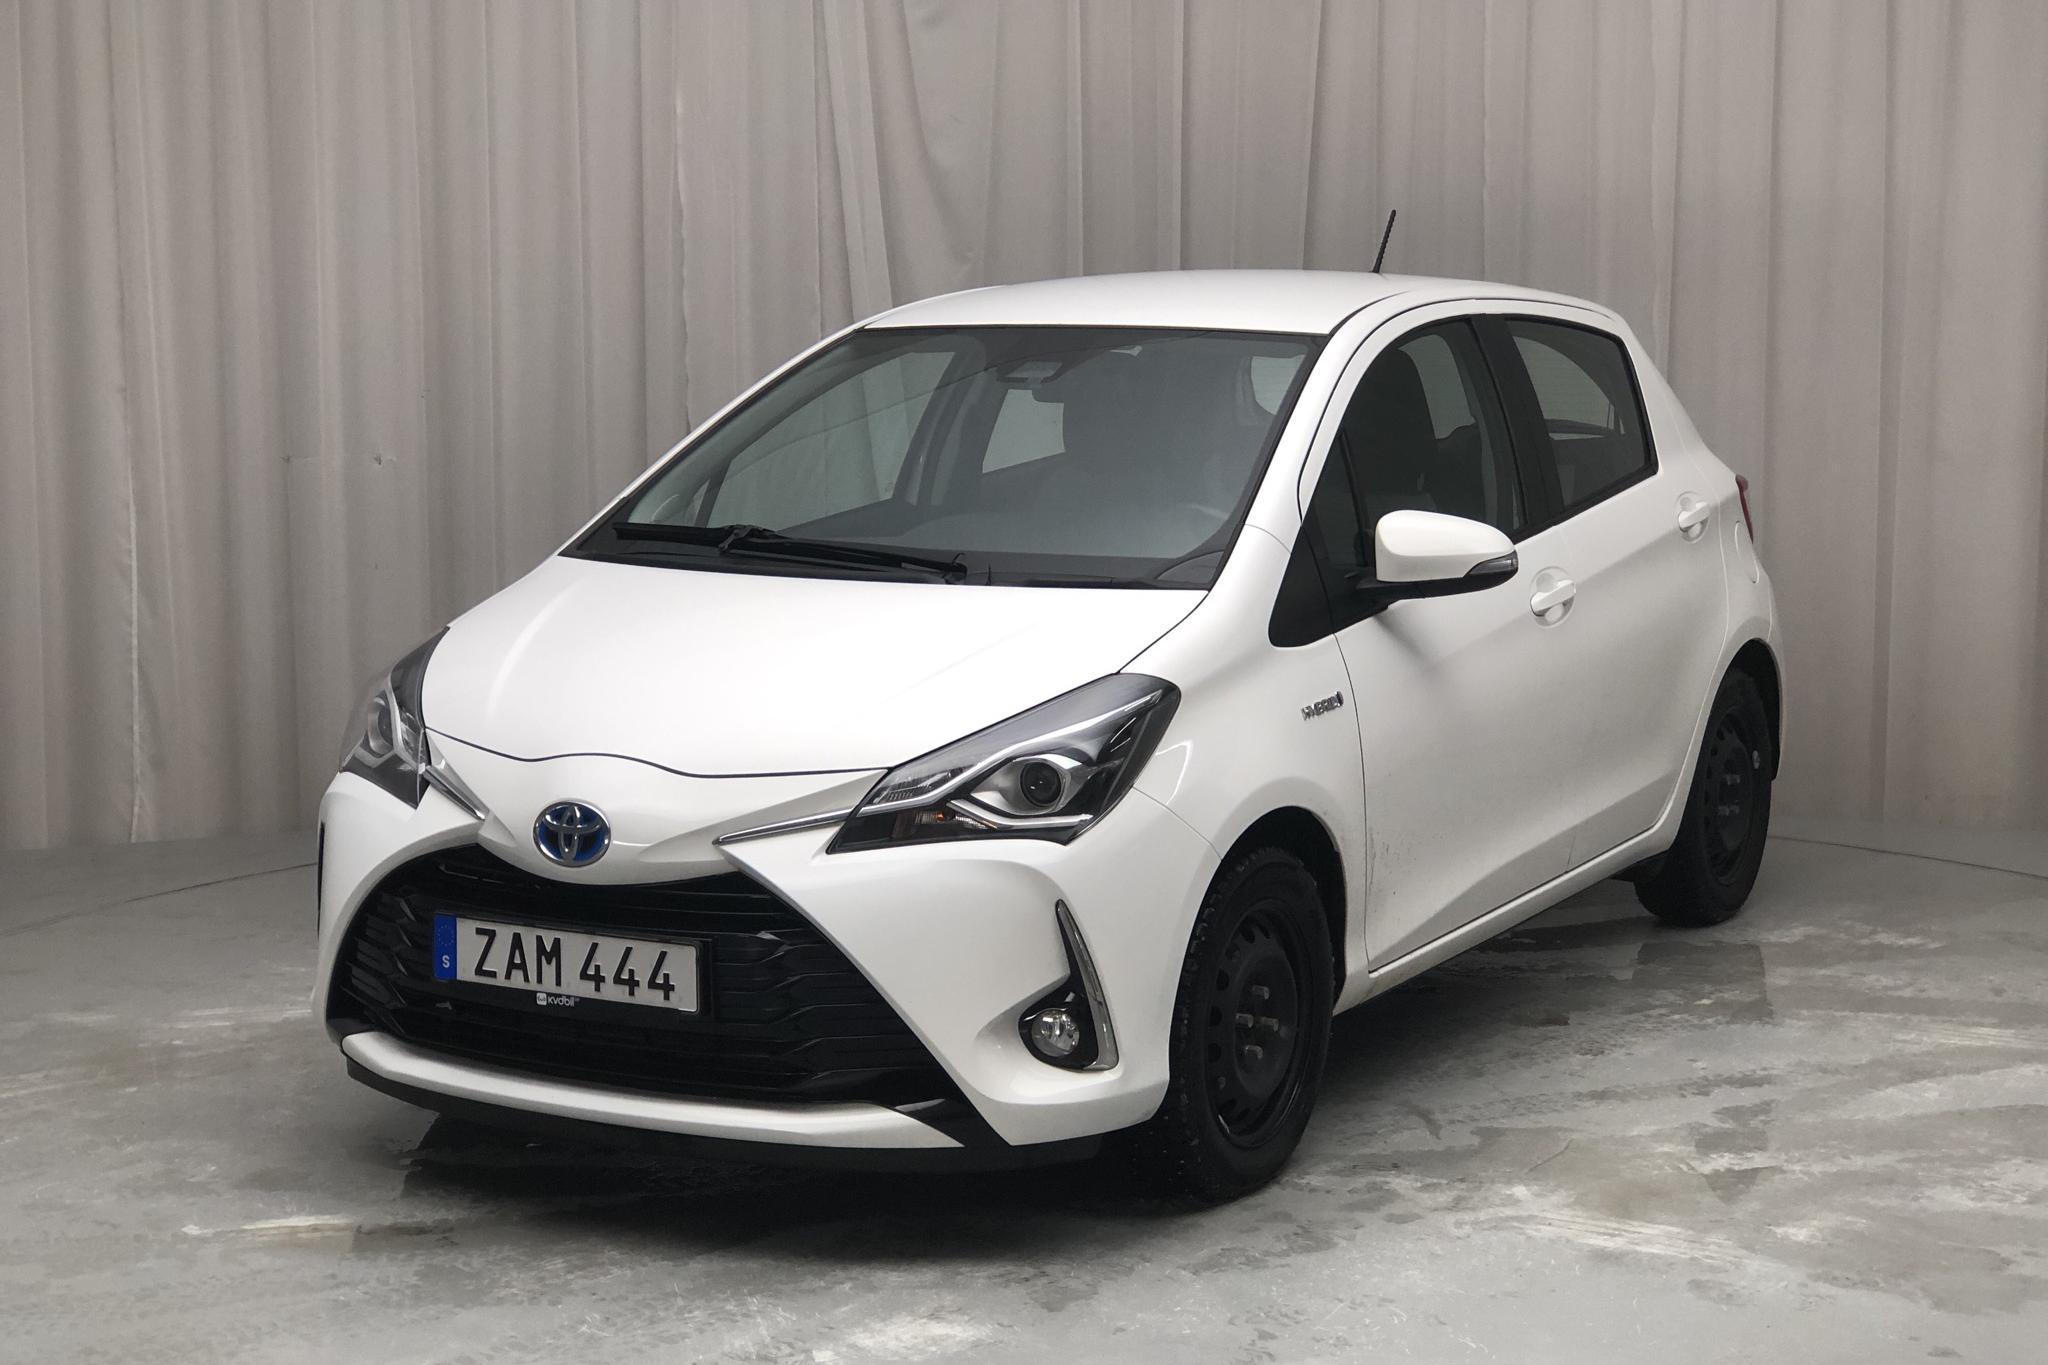 Toyota Yaris 1.5 Hybrid 5dr (101hk) - 4 531 mil - Automat - vit - 2018